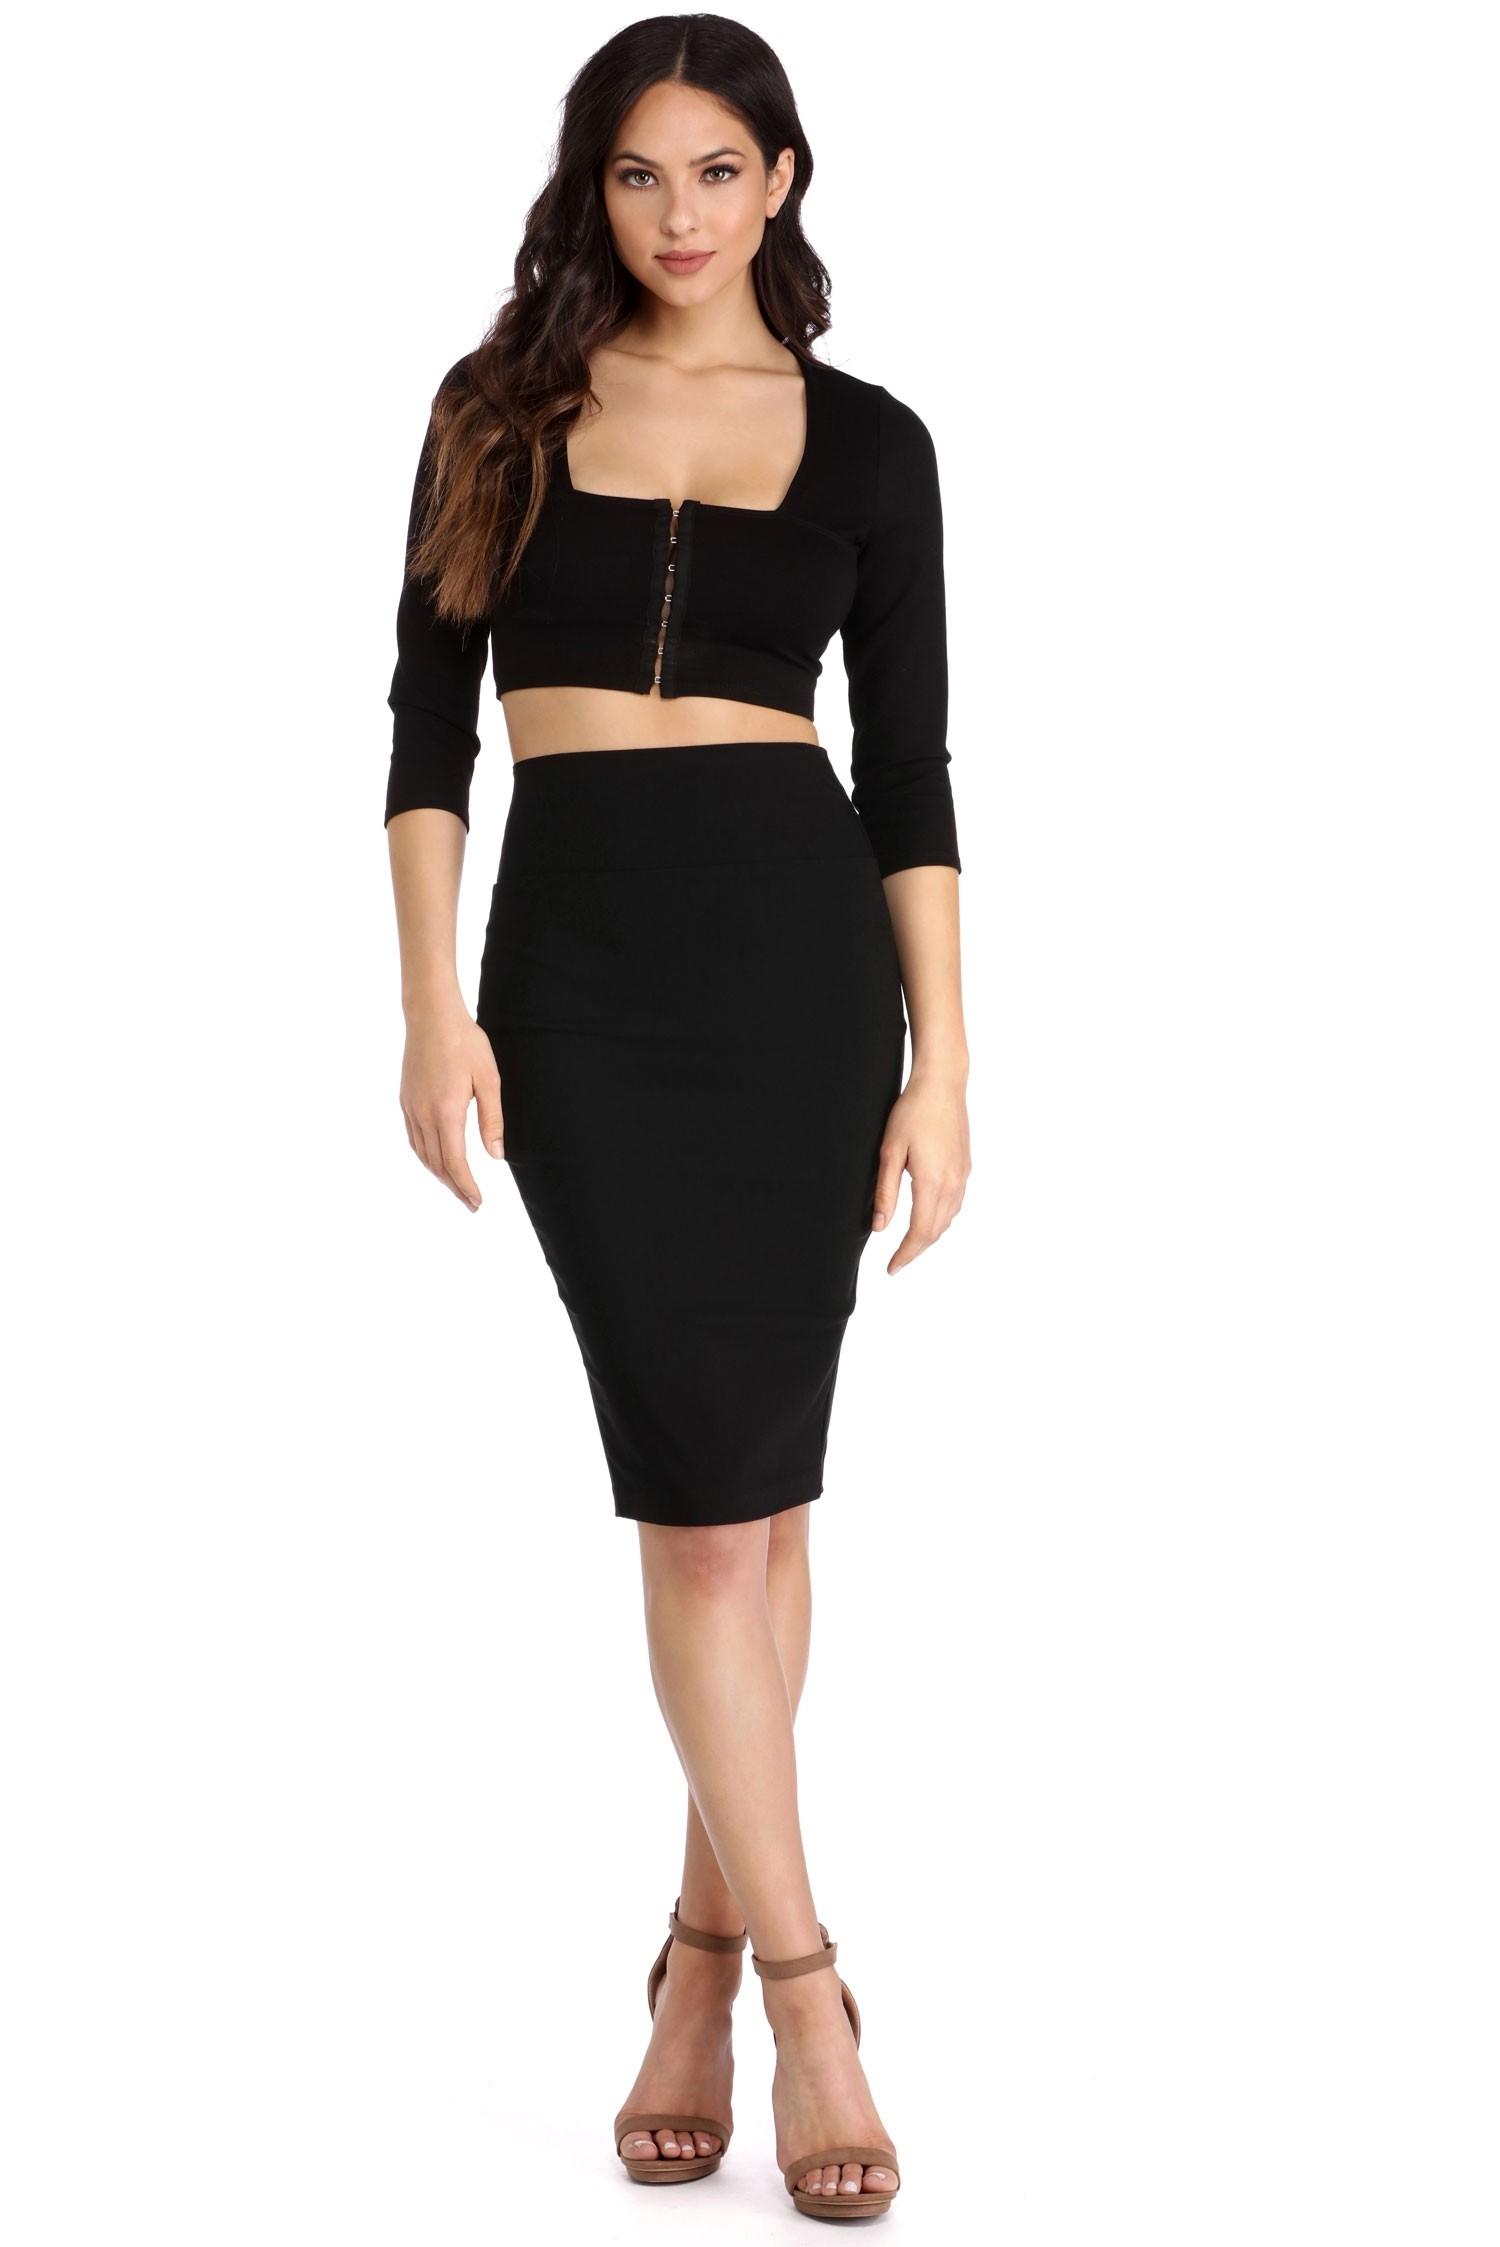 pencil skirts final sale- black high waisted pencil skirt rcaqqyn